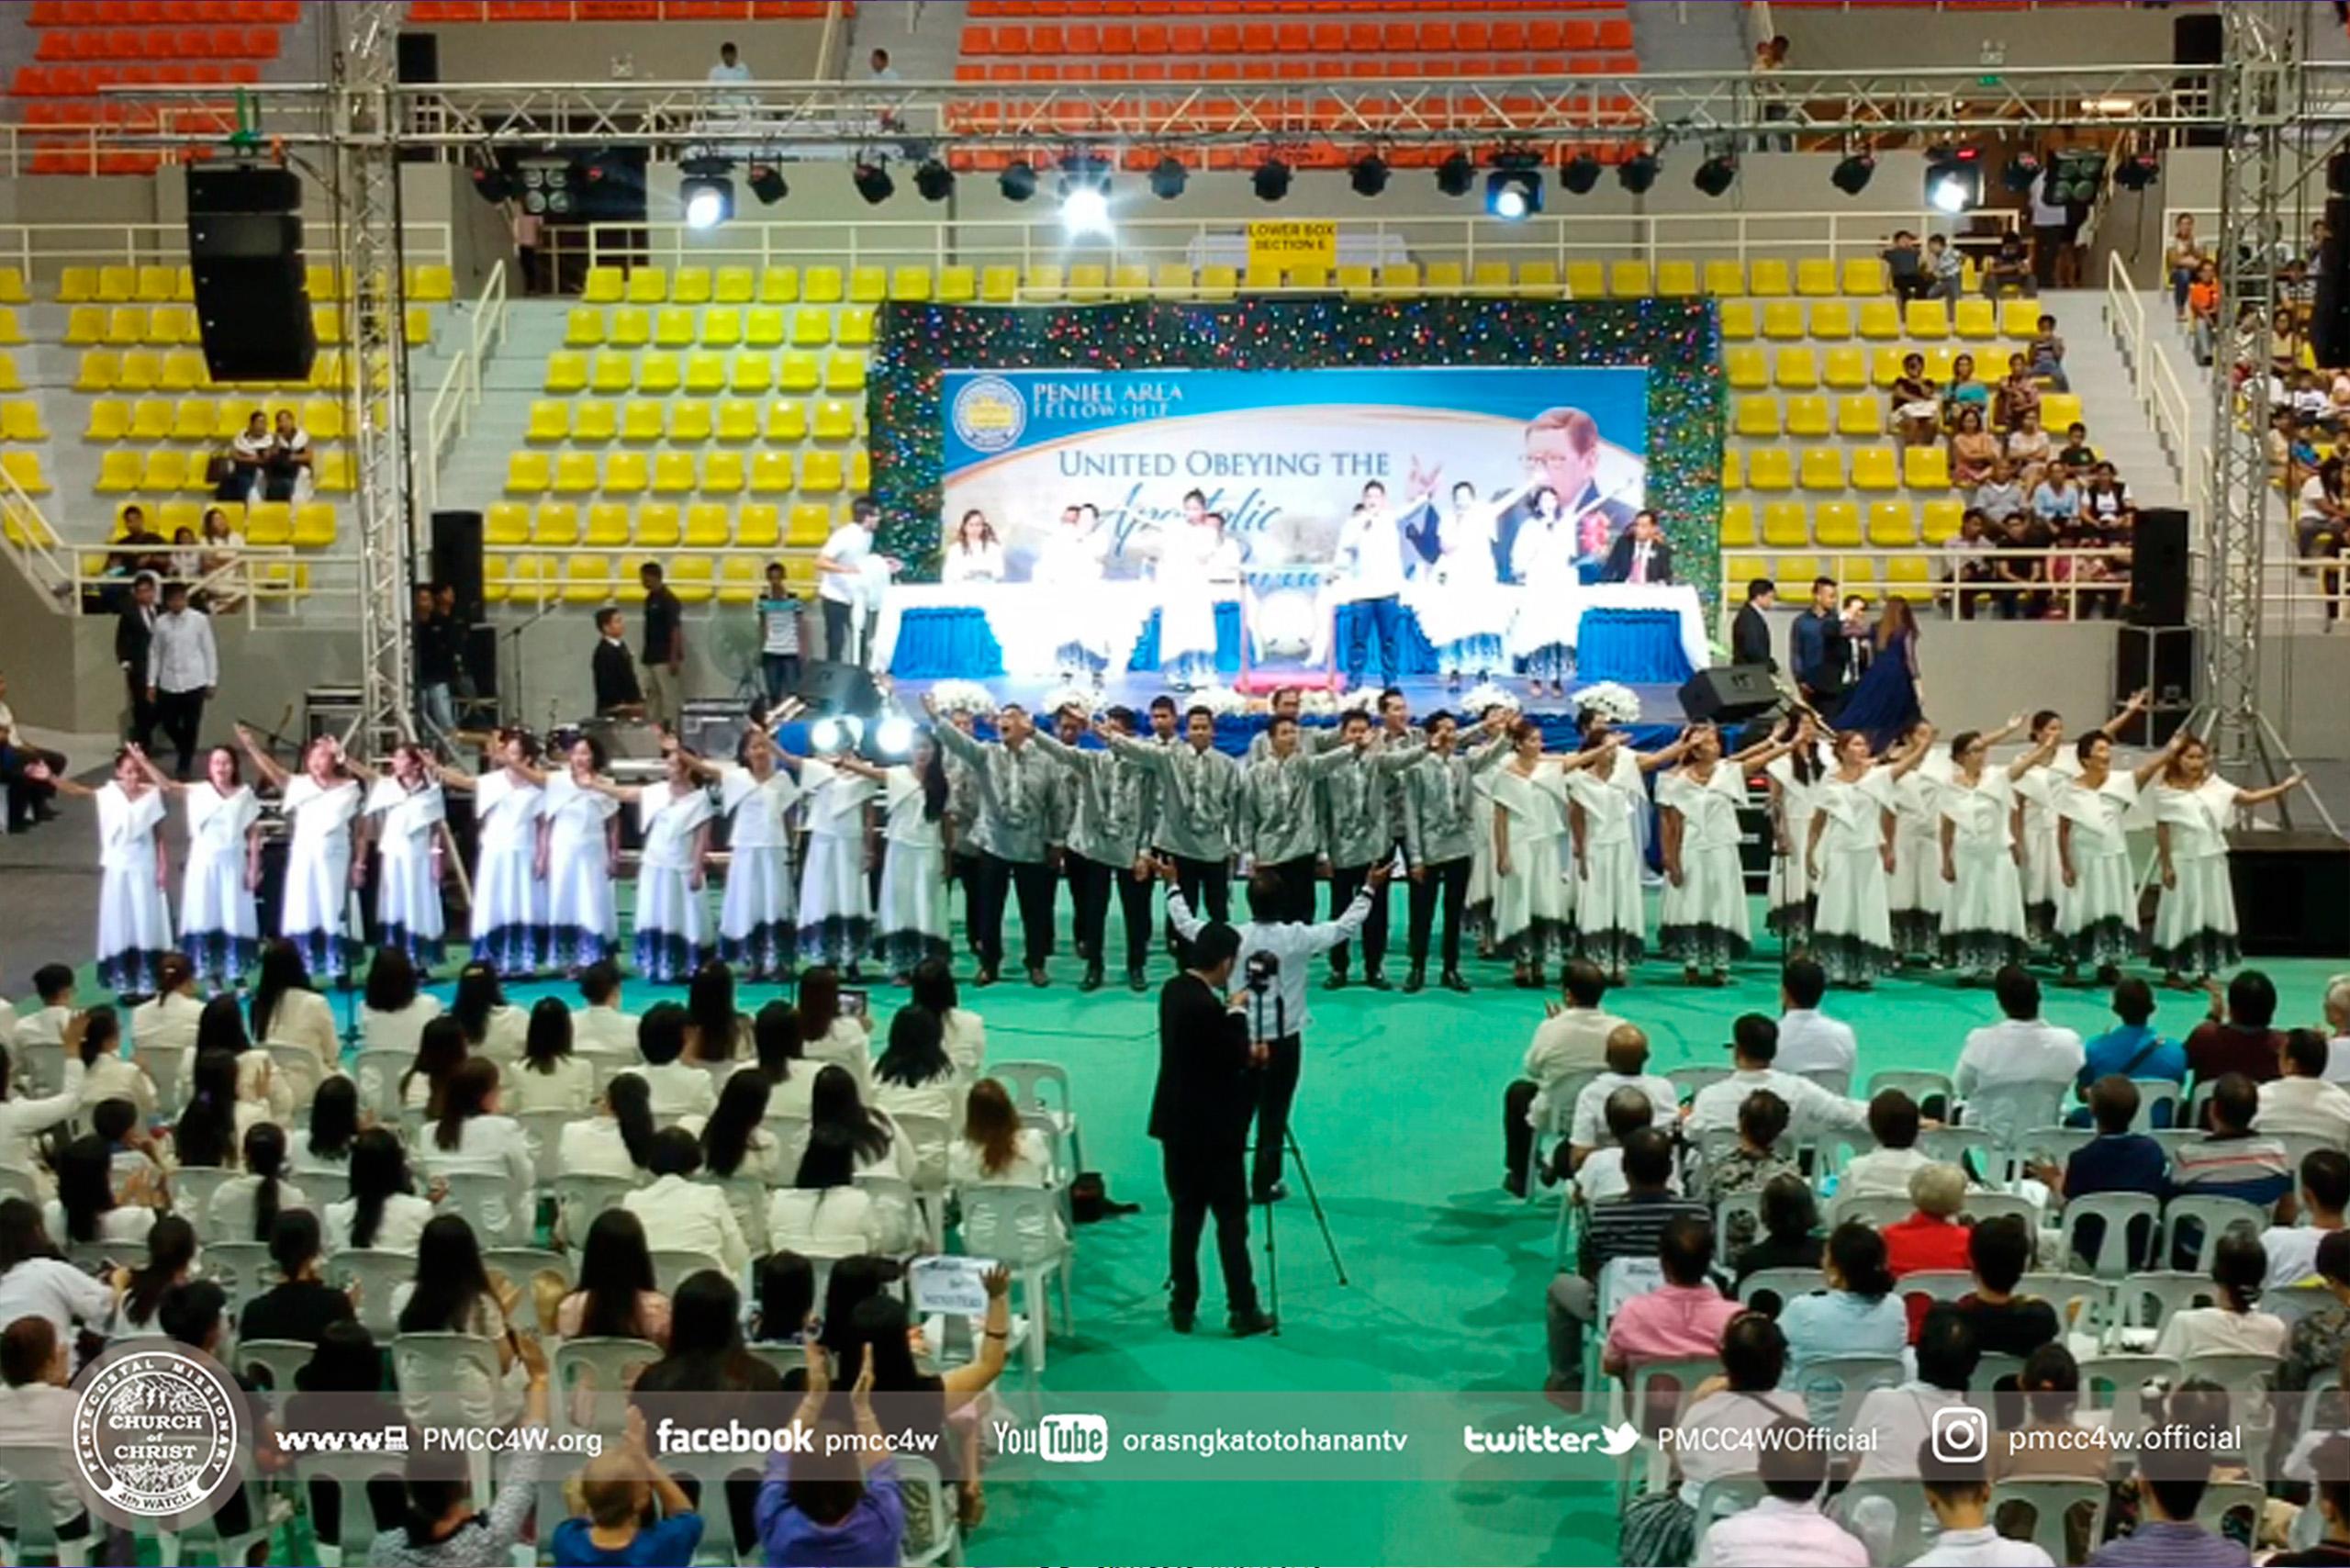 PMCC 4th Watch, Apostle, Arsenio T. Ferriol, AATF, Sport Complex, Church of Christ , 4th Watch, Fellowship, Christian